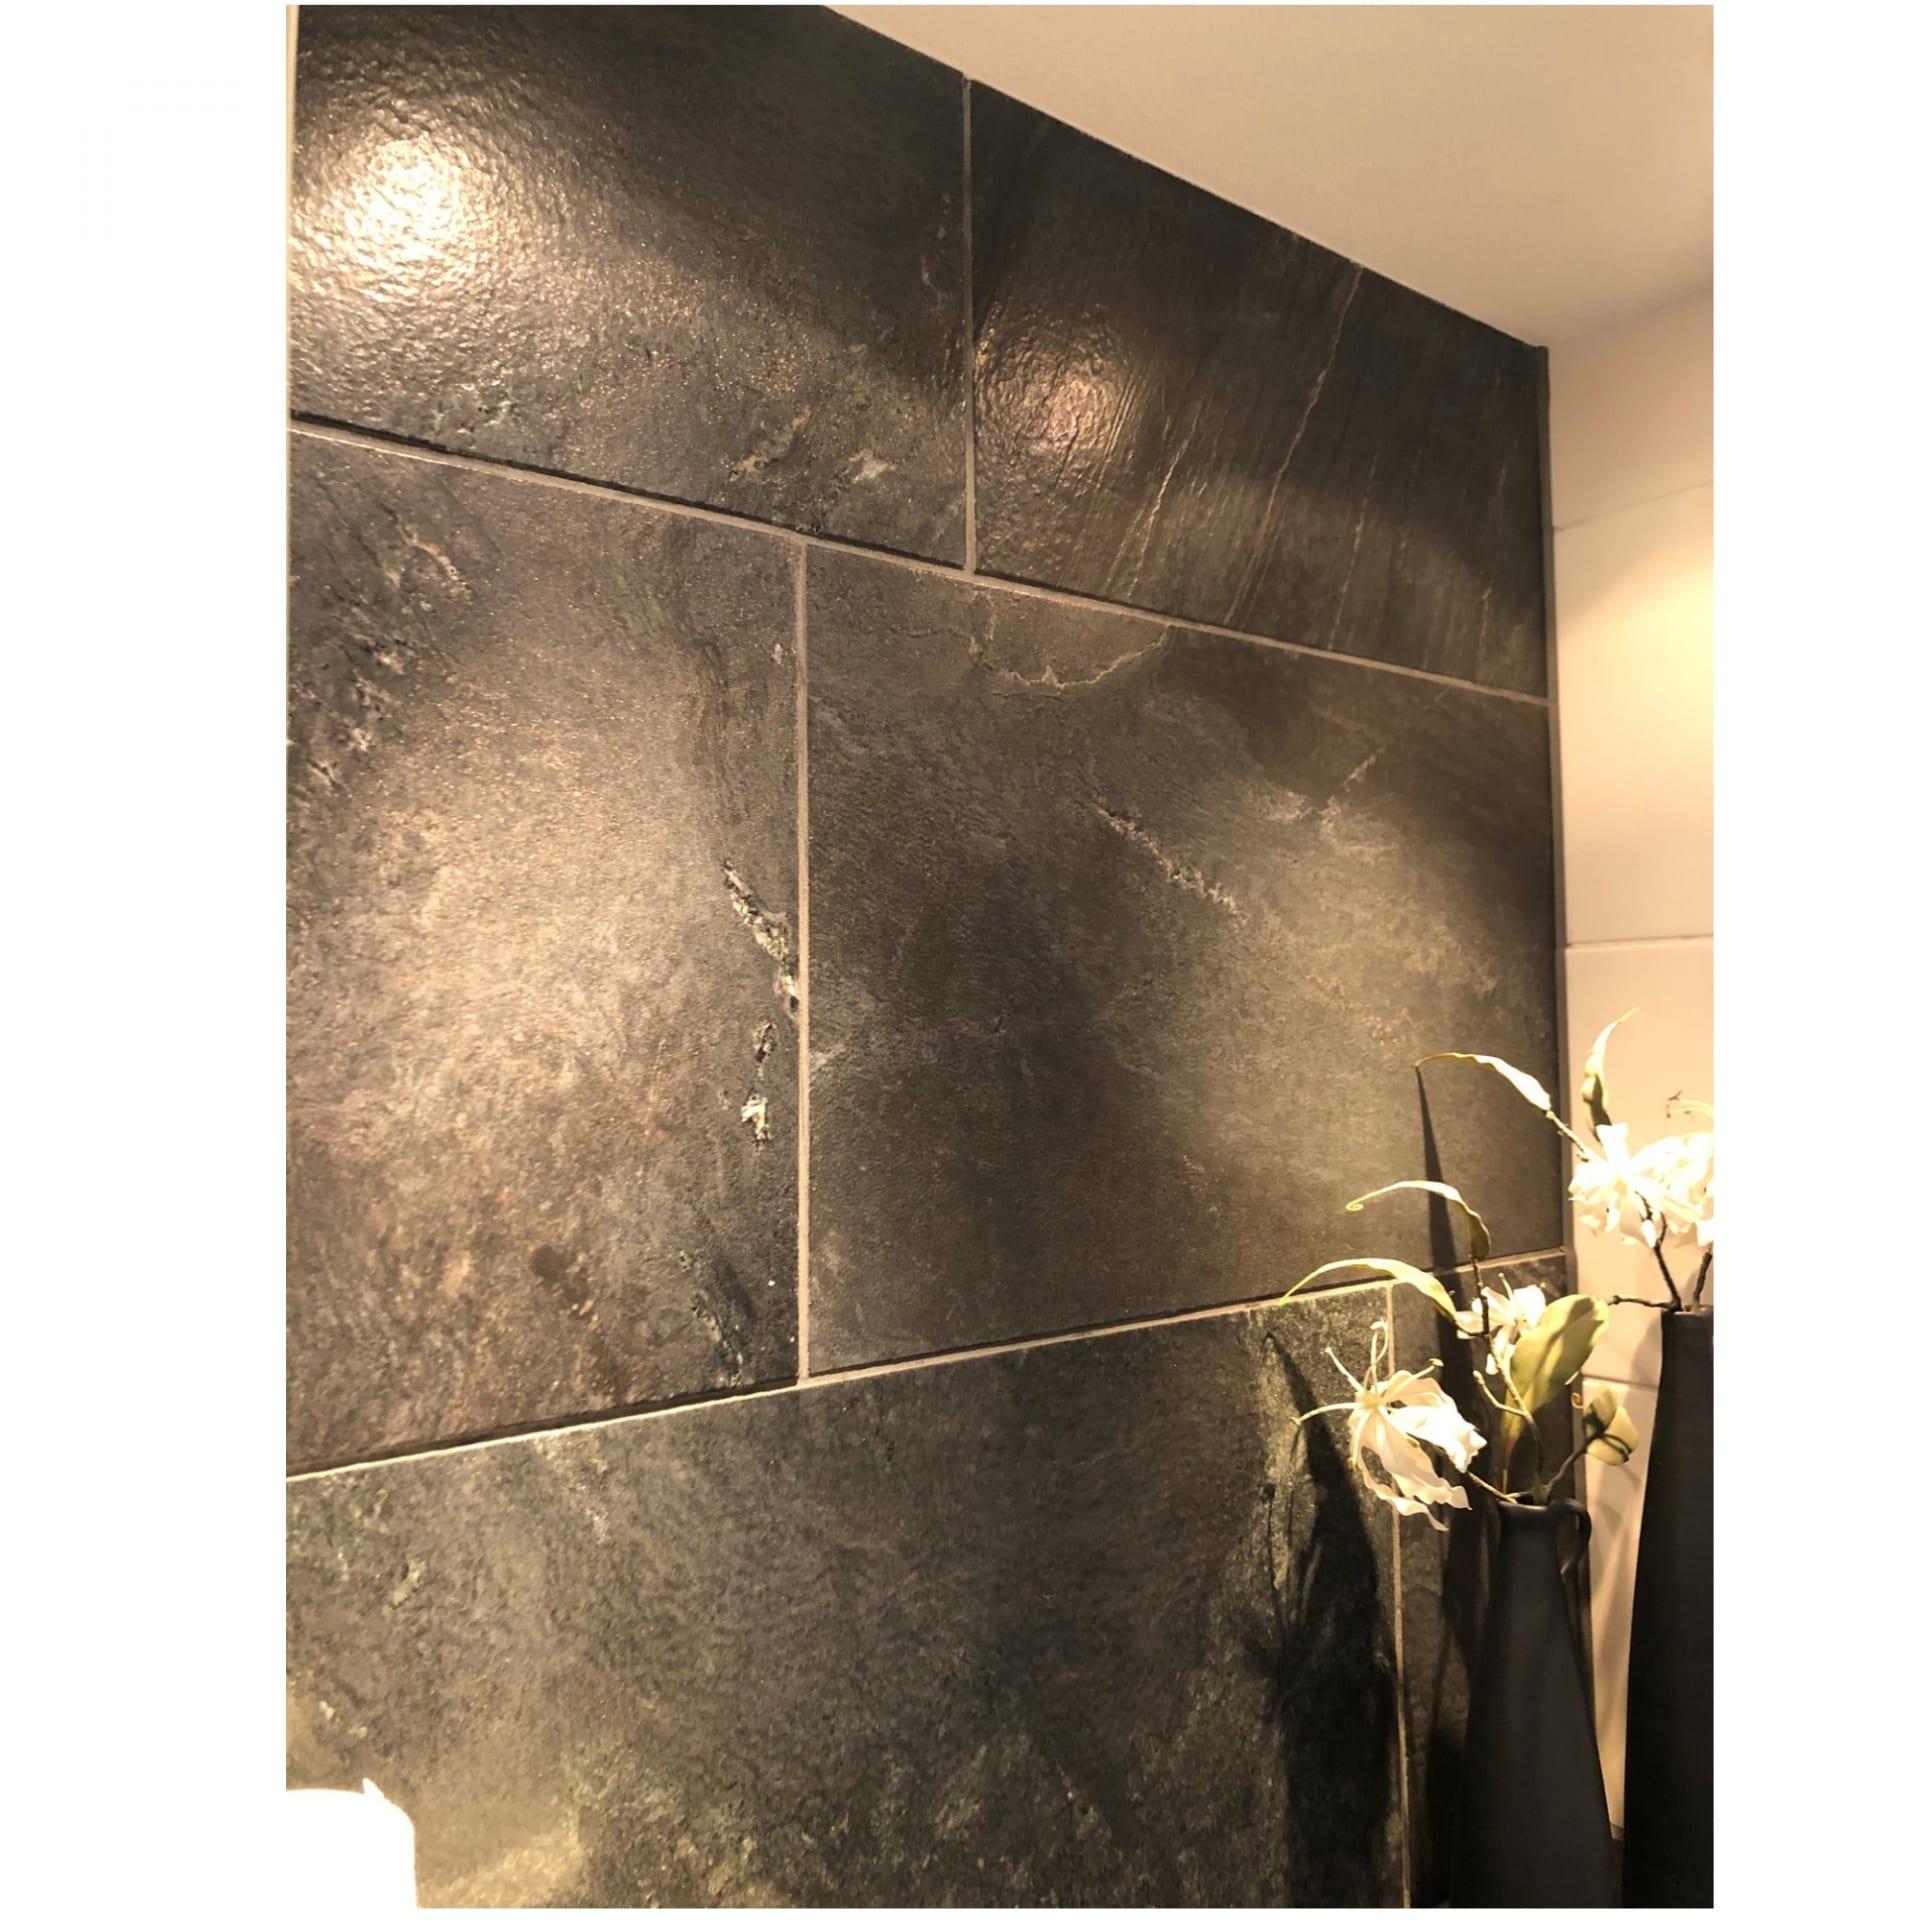 LEEUWARDEN – Carbon Gold vloer- en wandtegels toilet